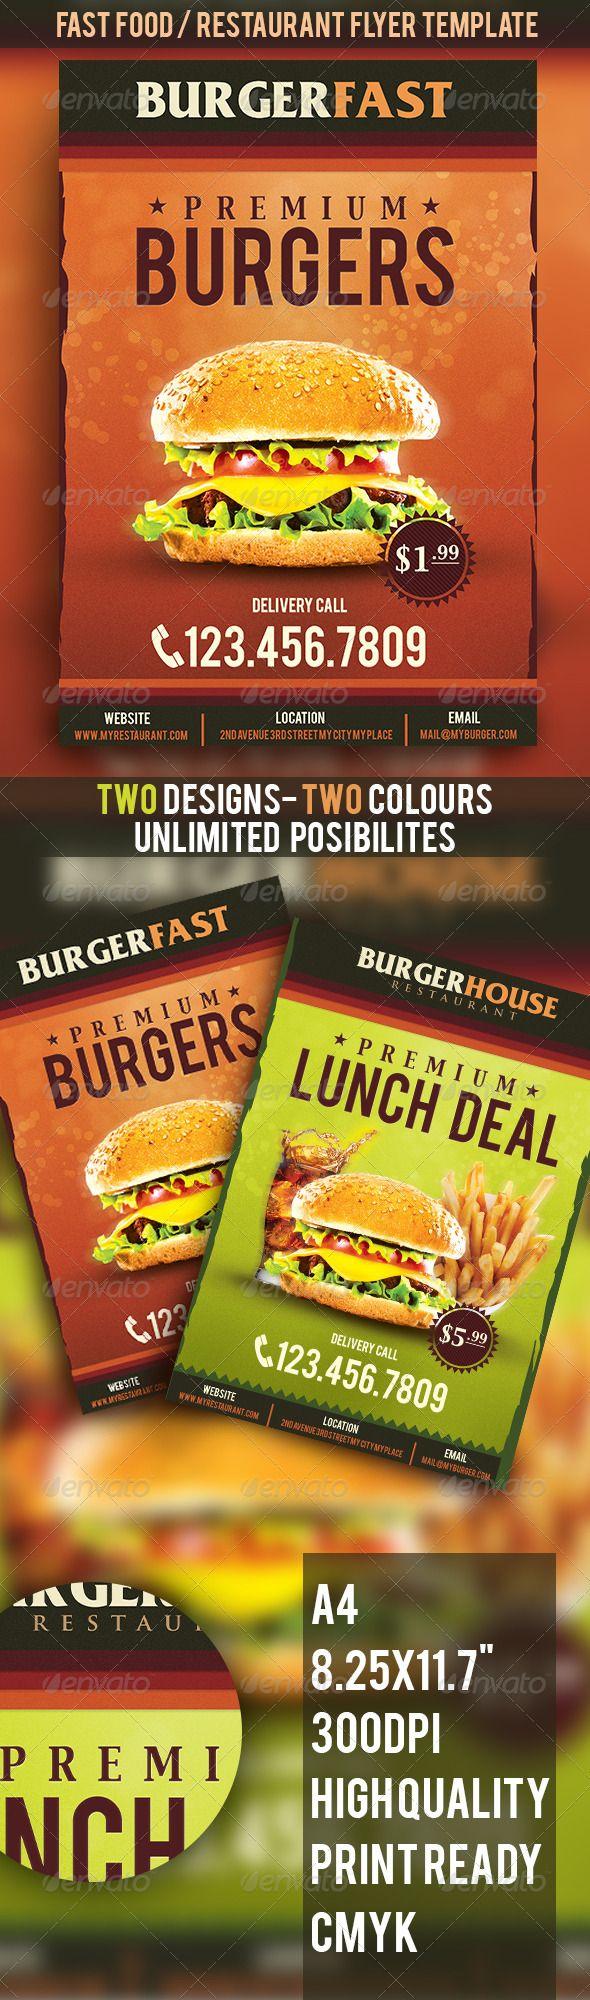 Premium Fast FoodRestaurant Flyer Template – Food Flyer Template